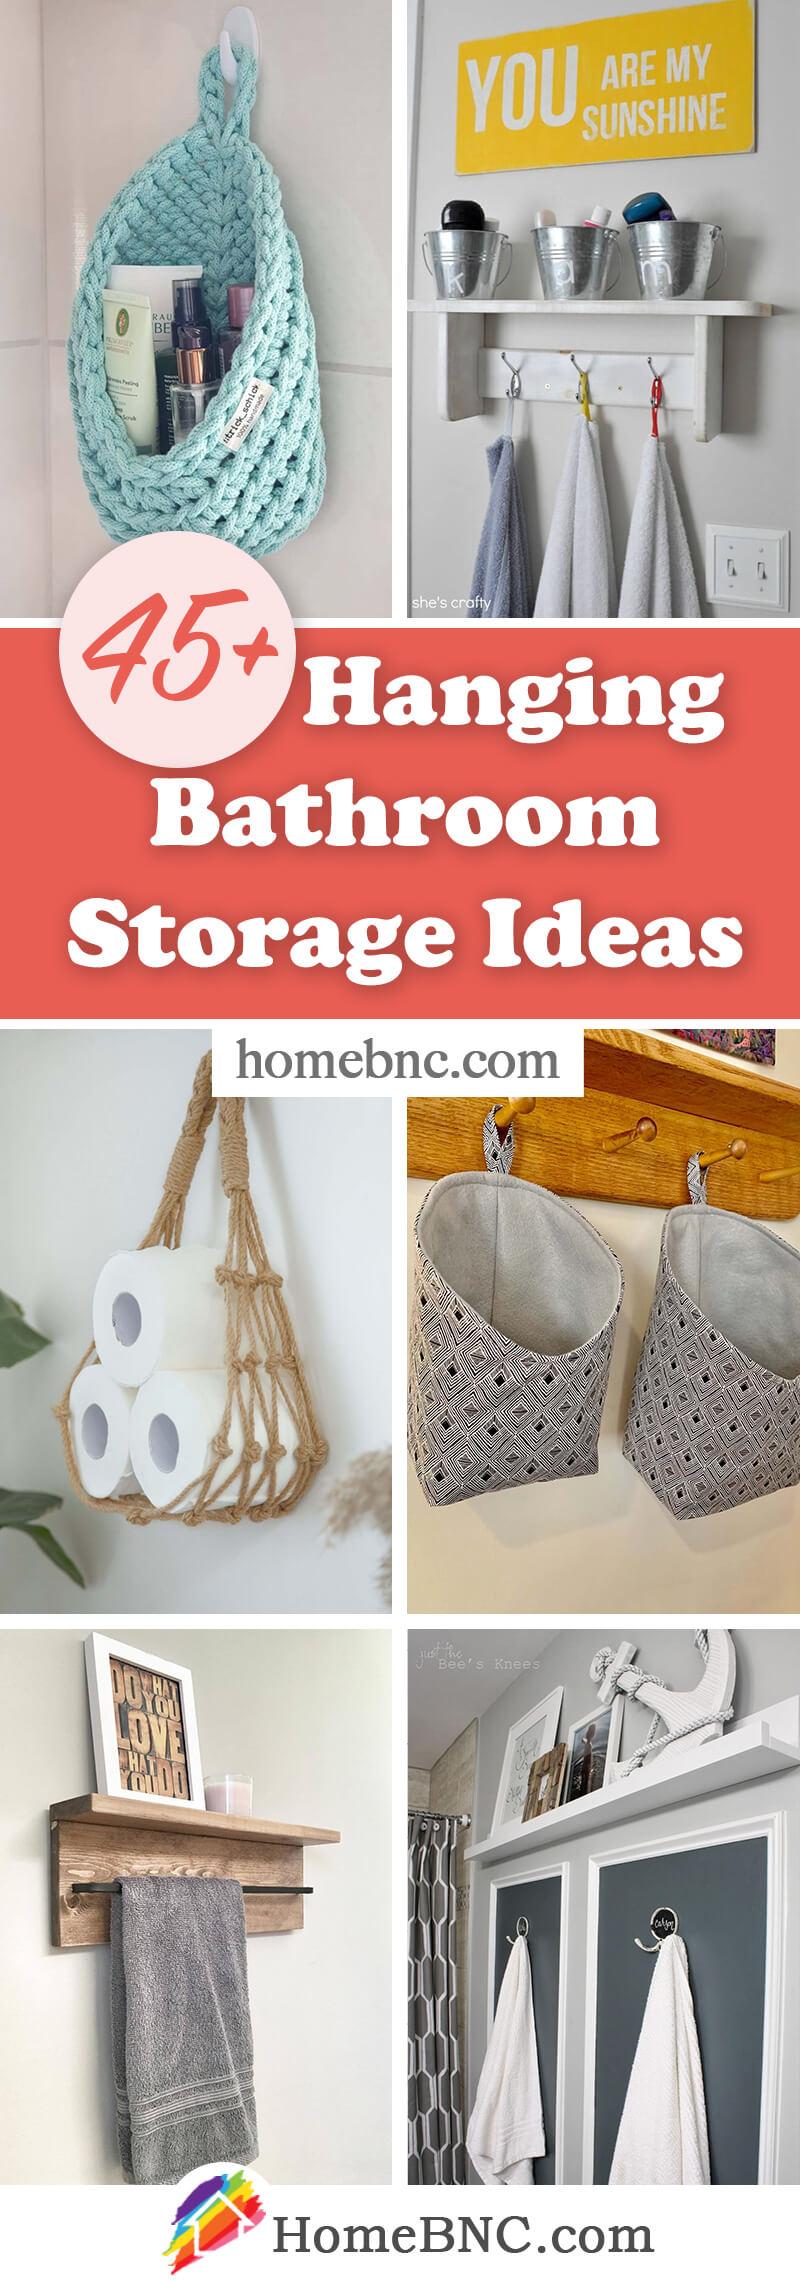 Hanging Bathroom Storage Ideas